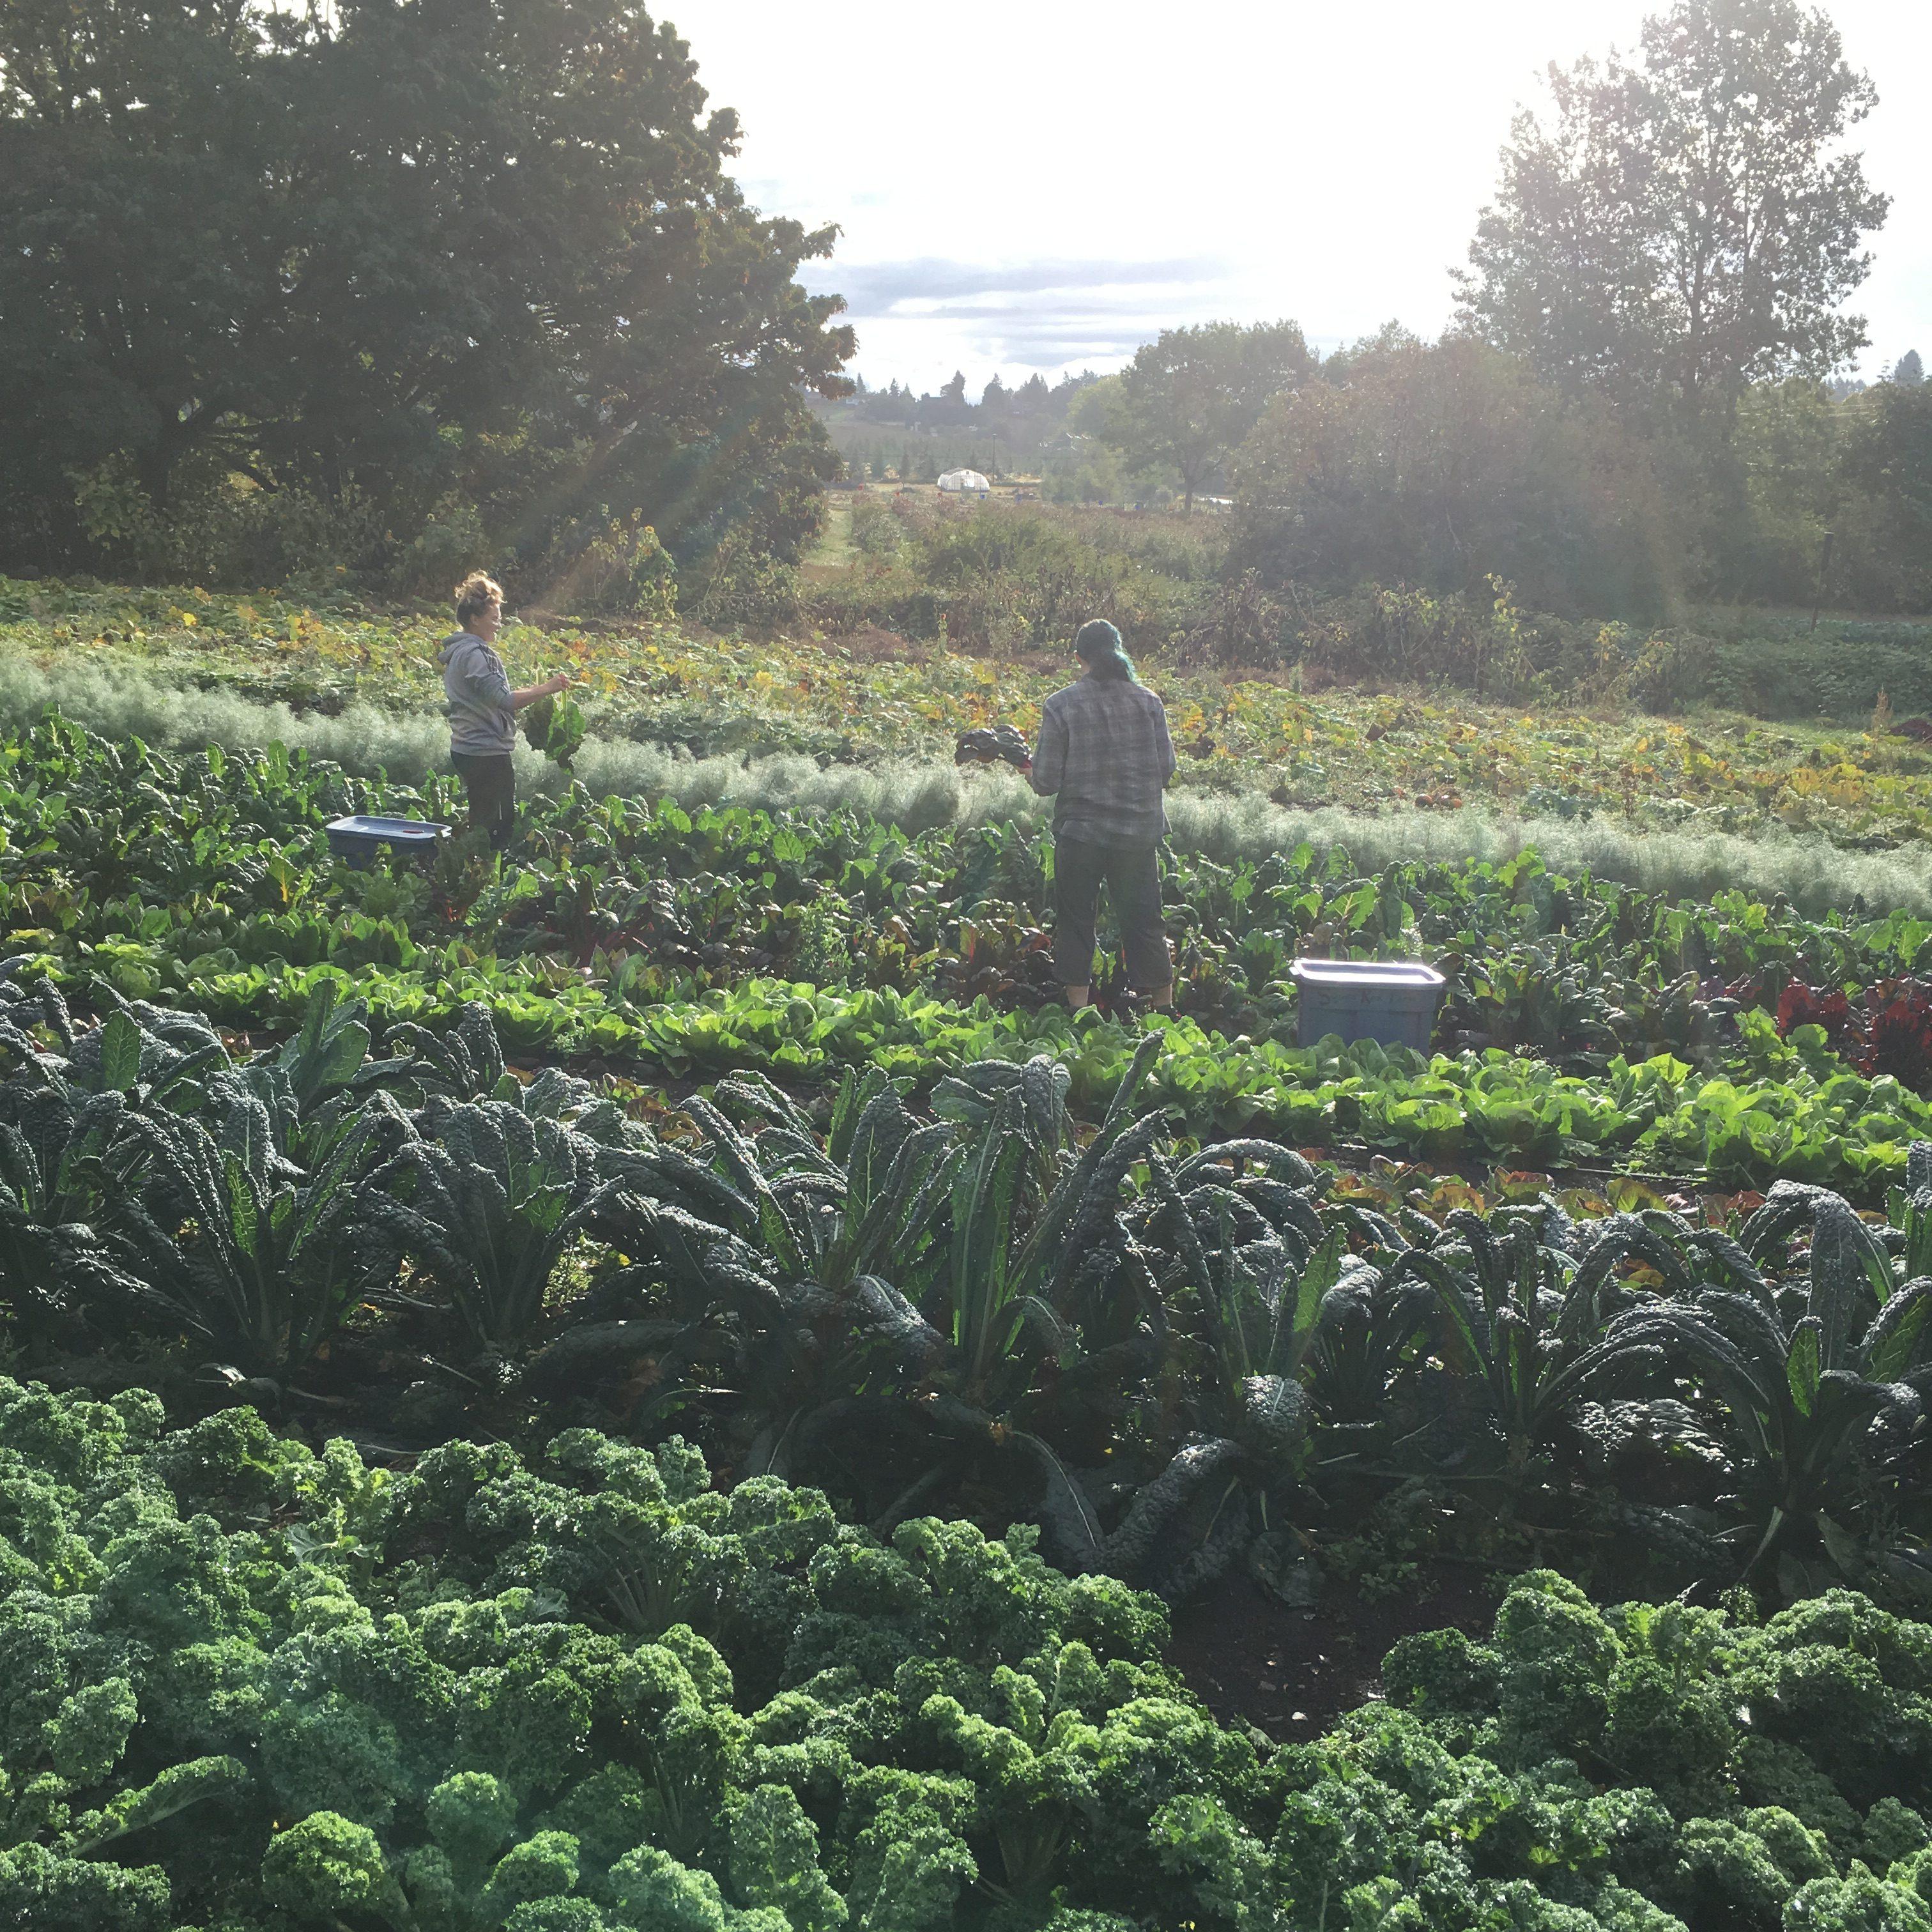 square root farm, farm job, victoria, vancouver island, saanich